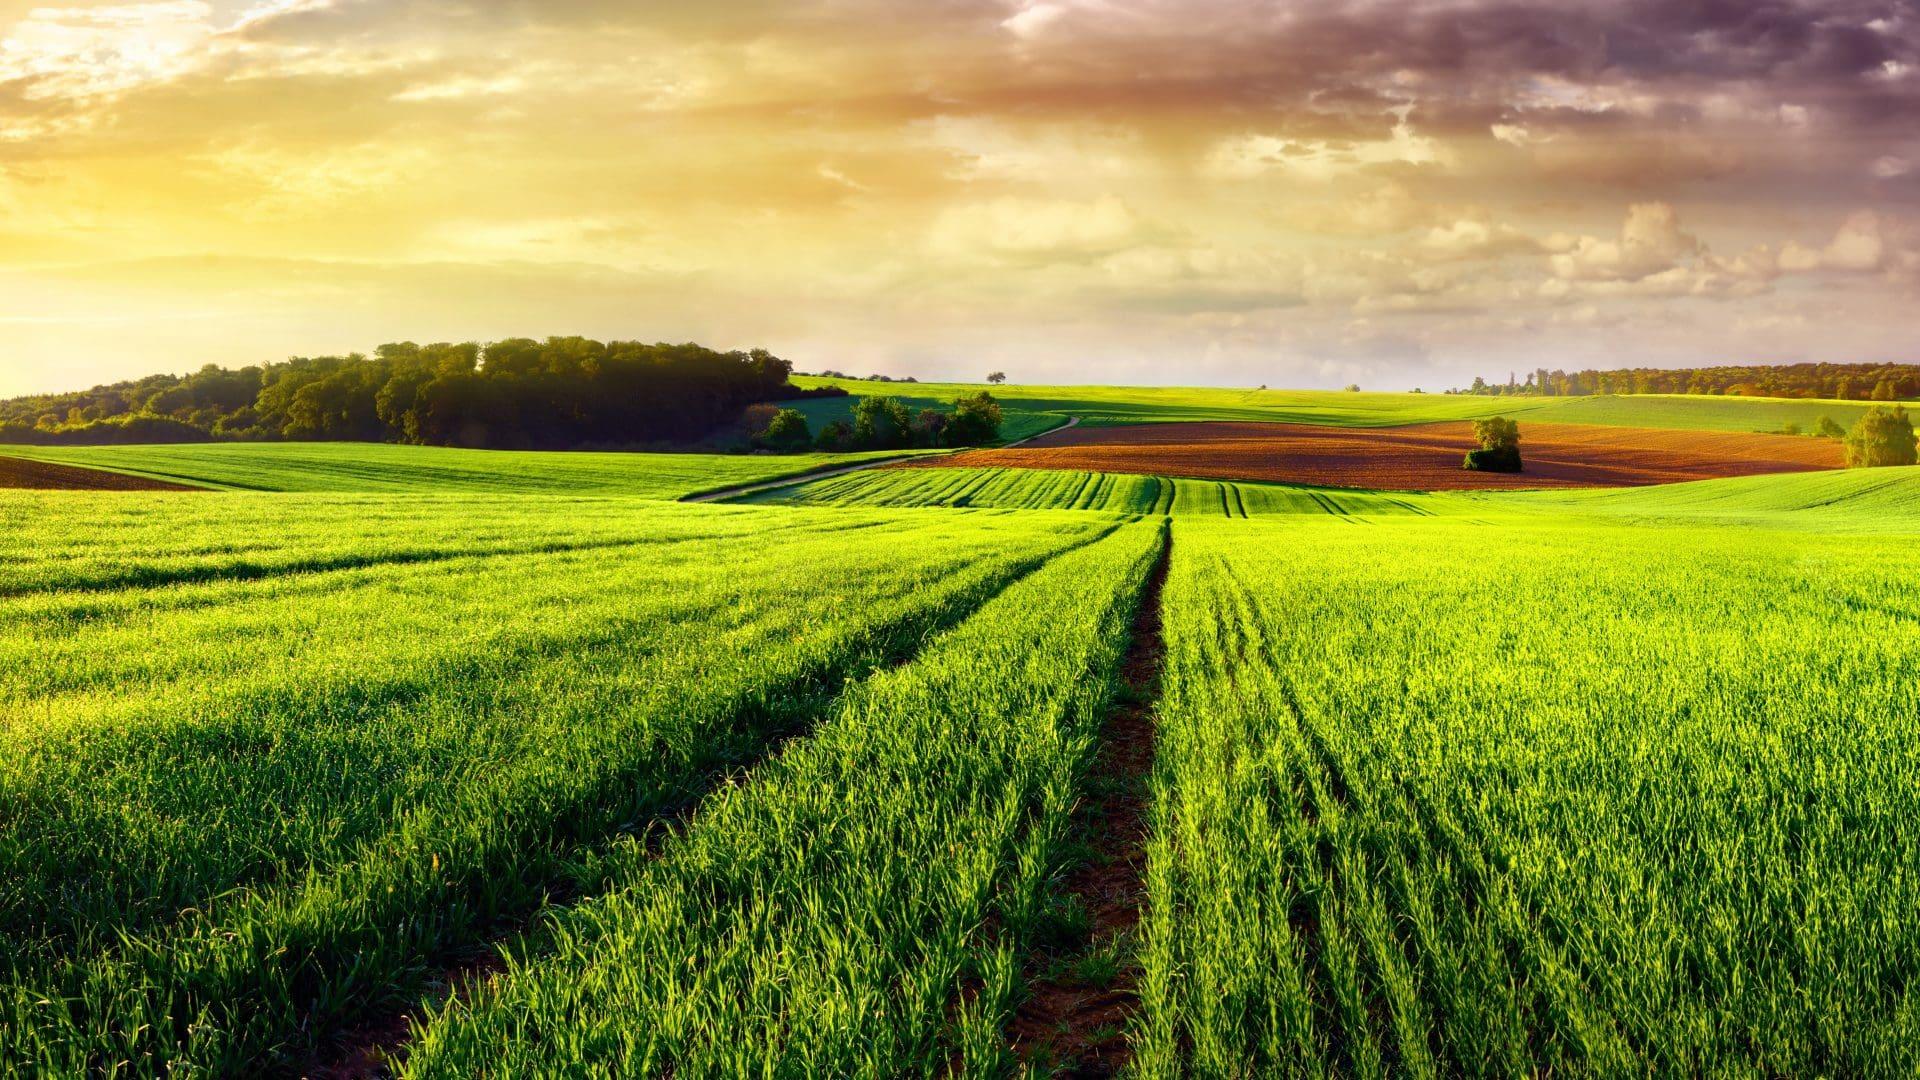 Koje Prednosti Vam Mogu Doneti Rešenja Za Poljoprivredne Rizike?